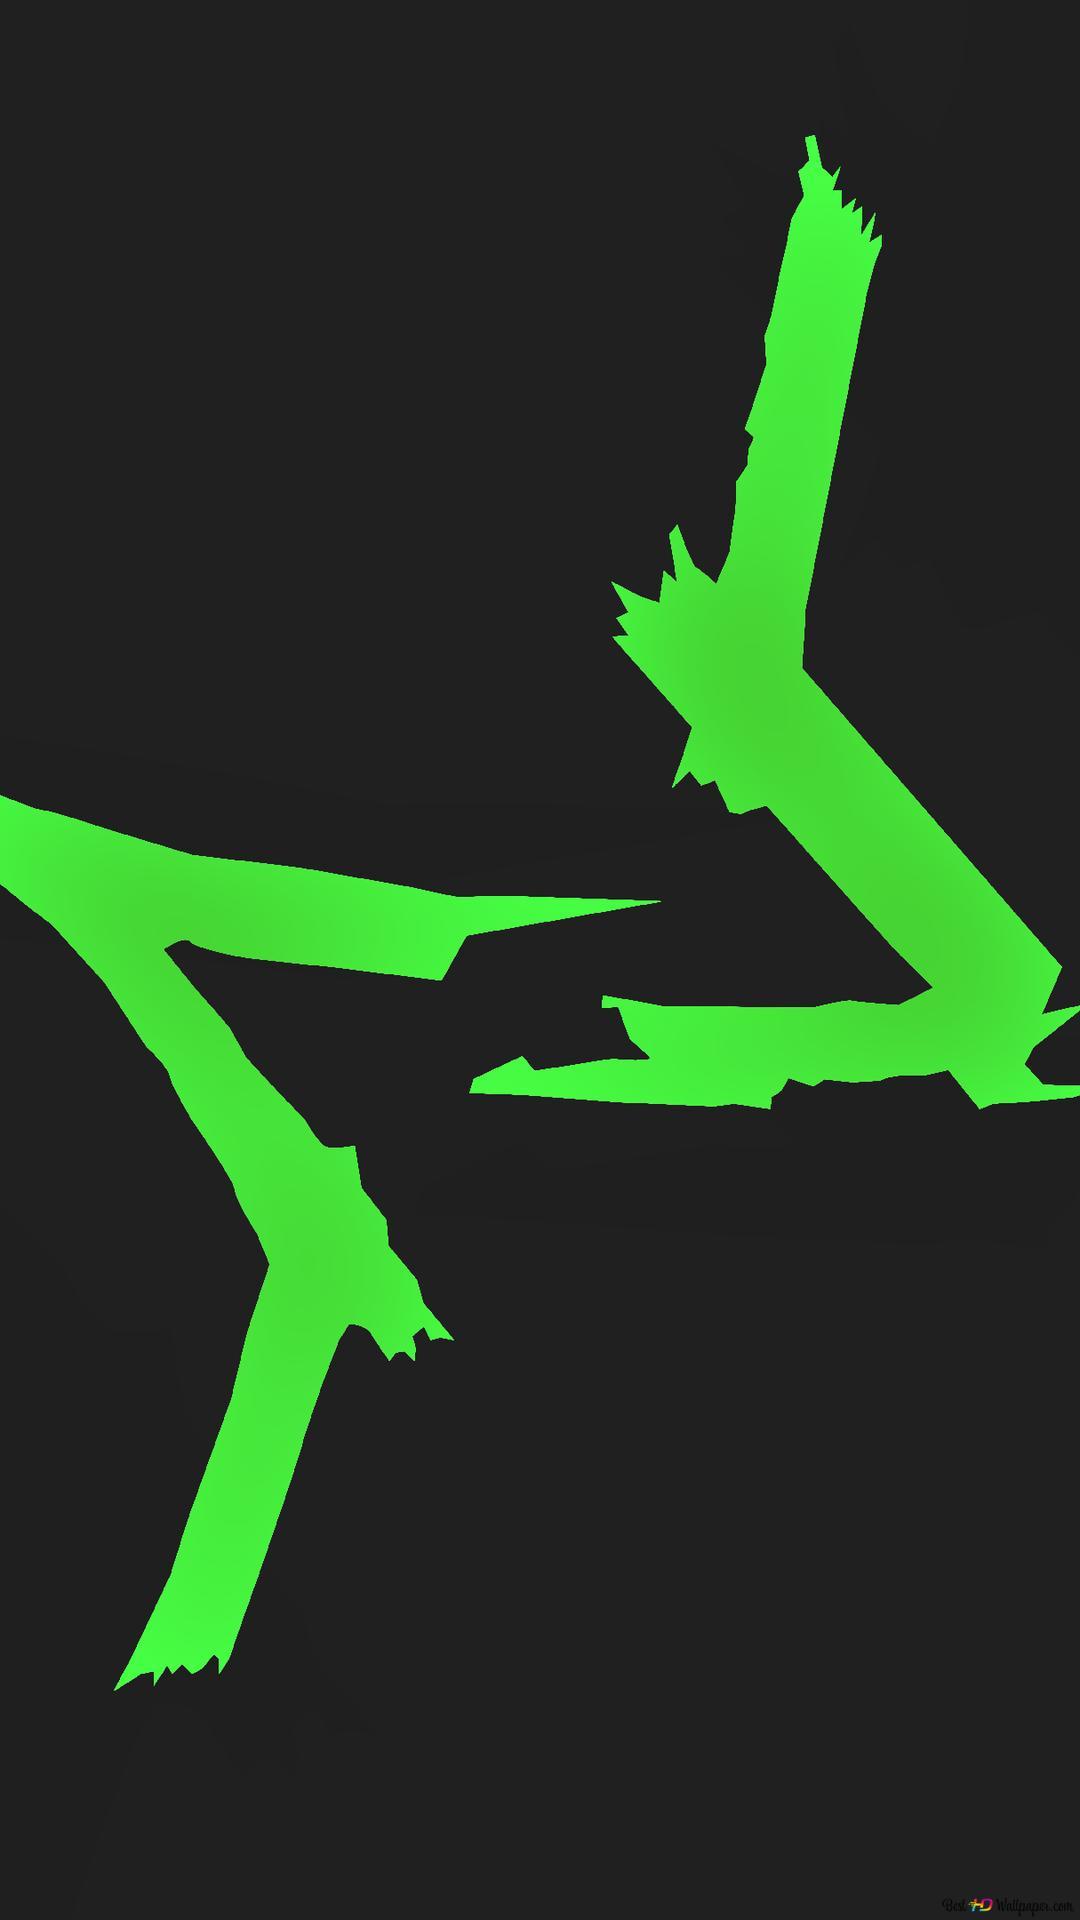 Watch Dogs Emblem Hd Wallpaper Download